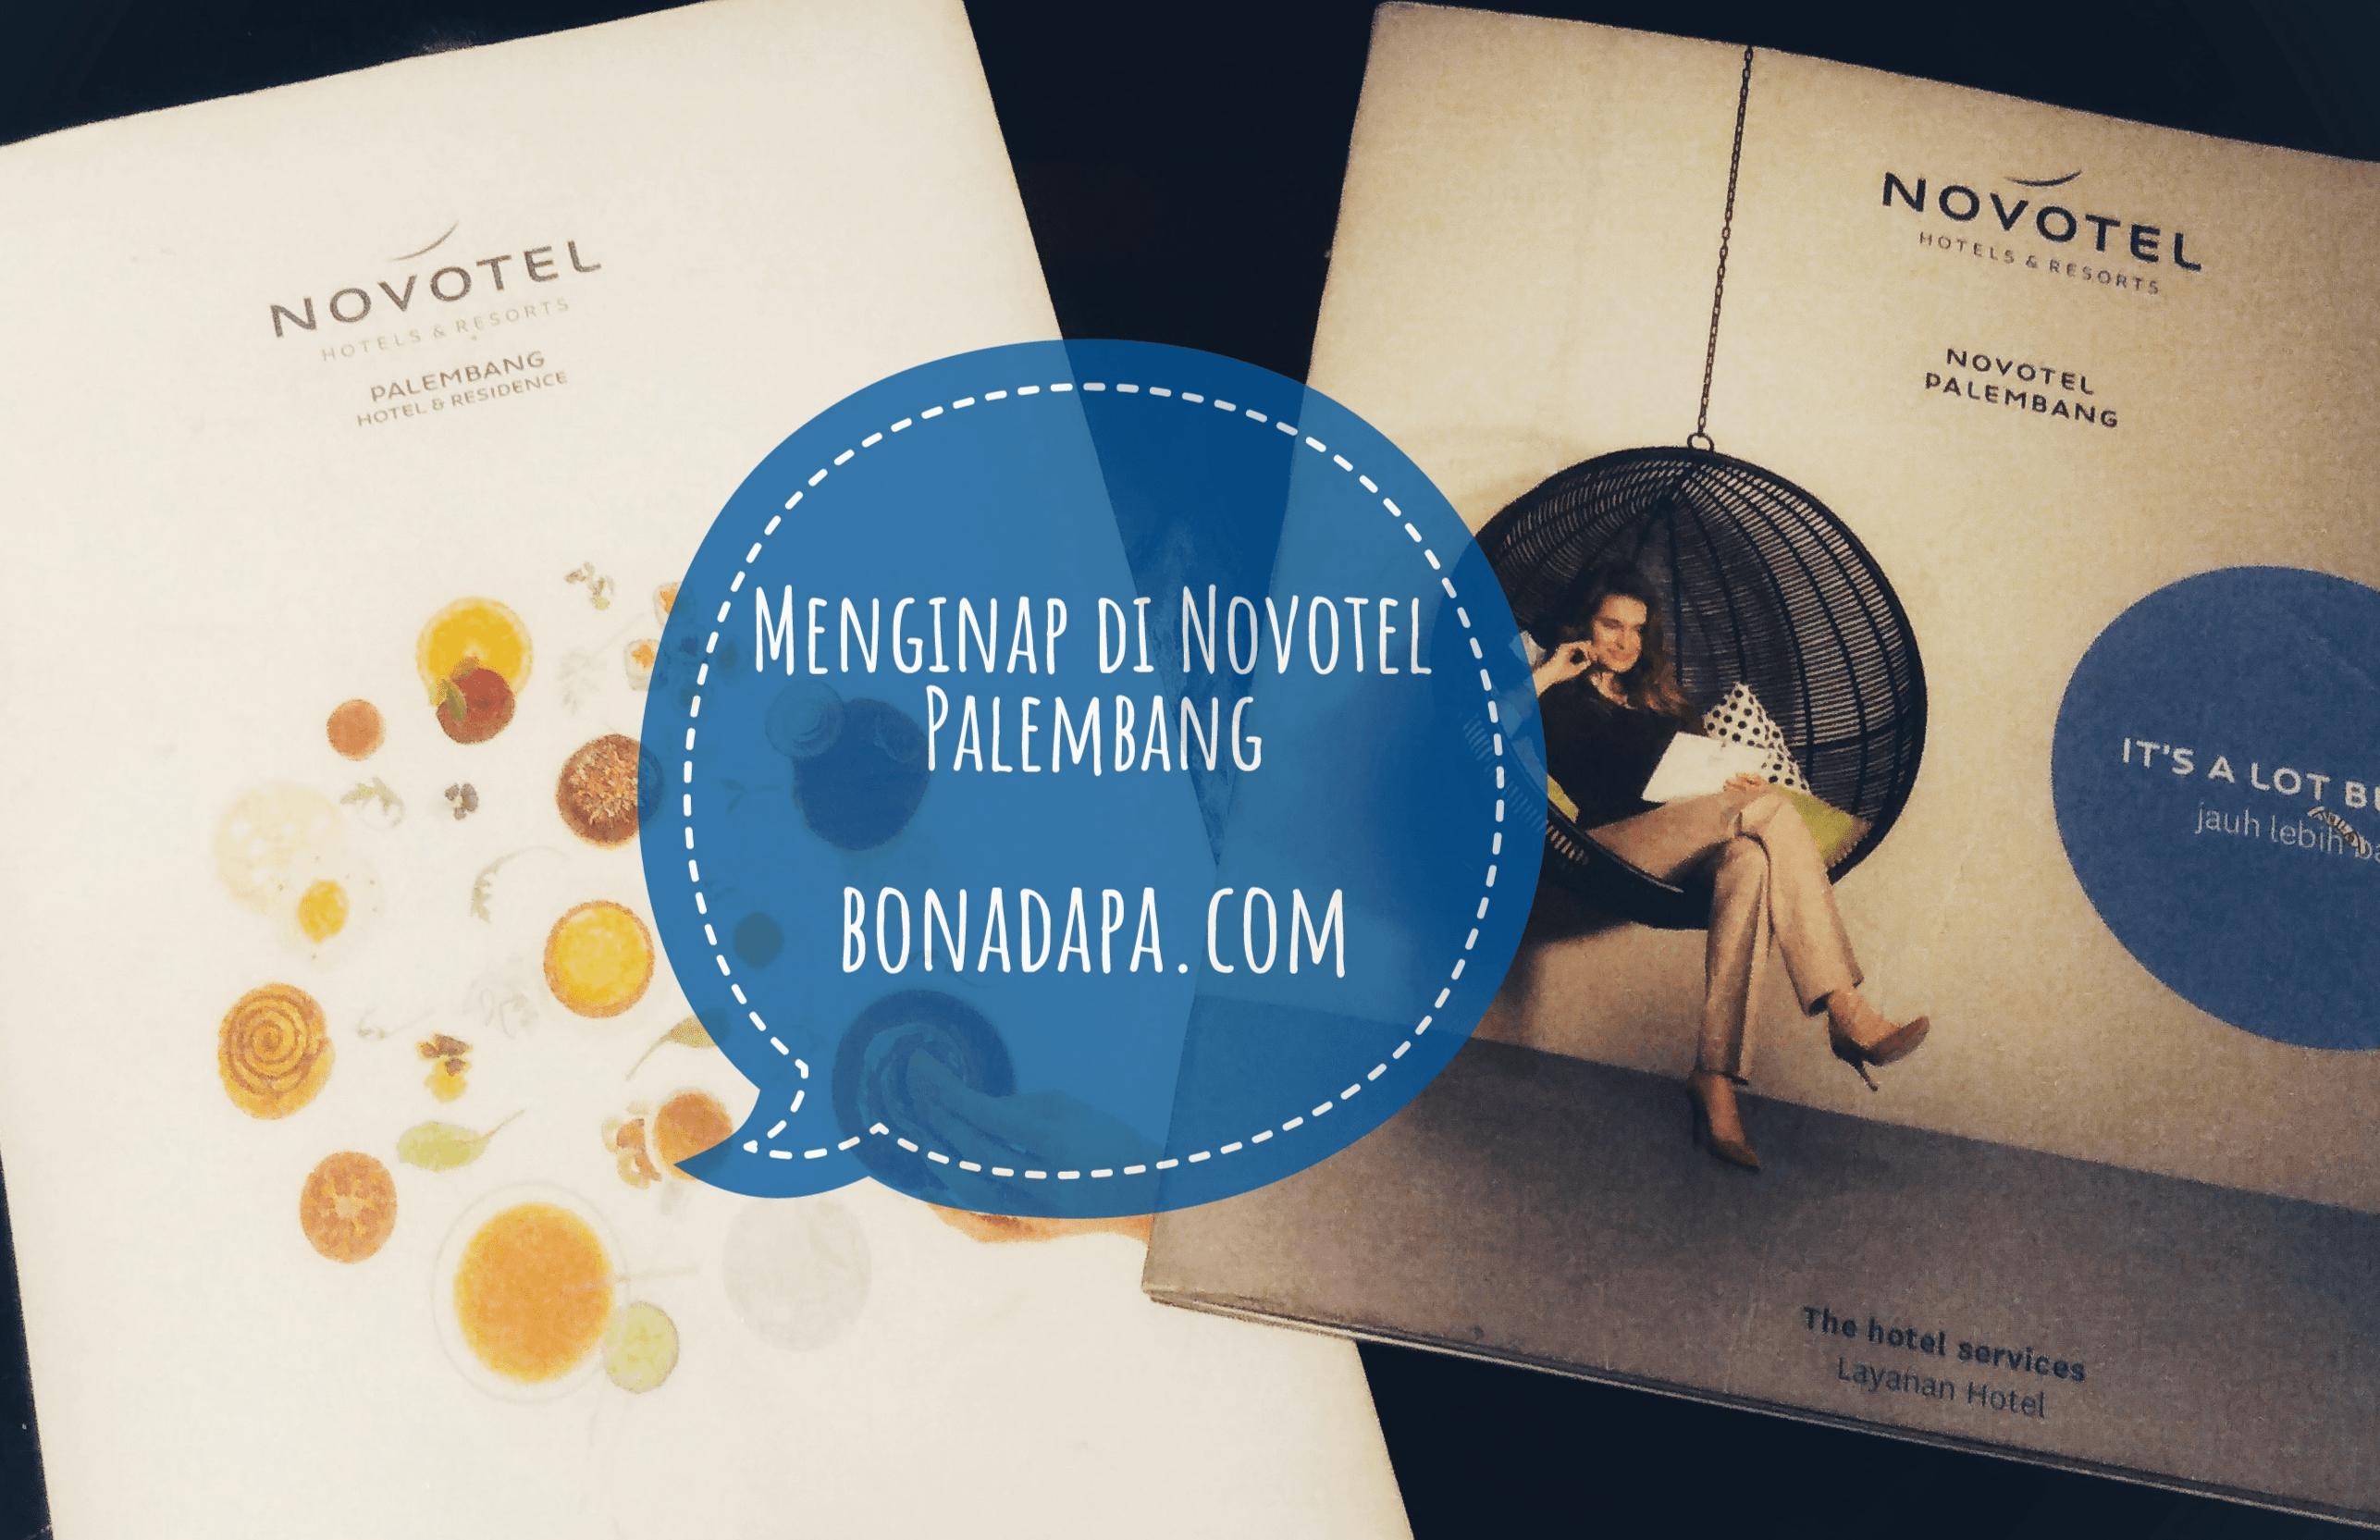 Review : Pengalaman Menginap di Hotel Novotel Palembang